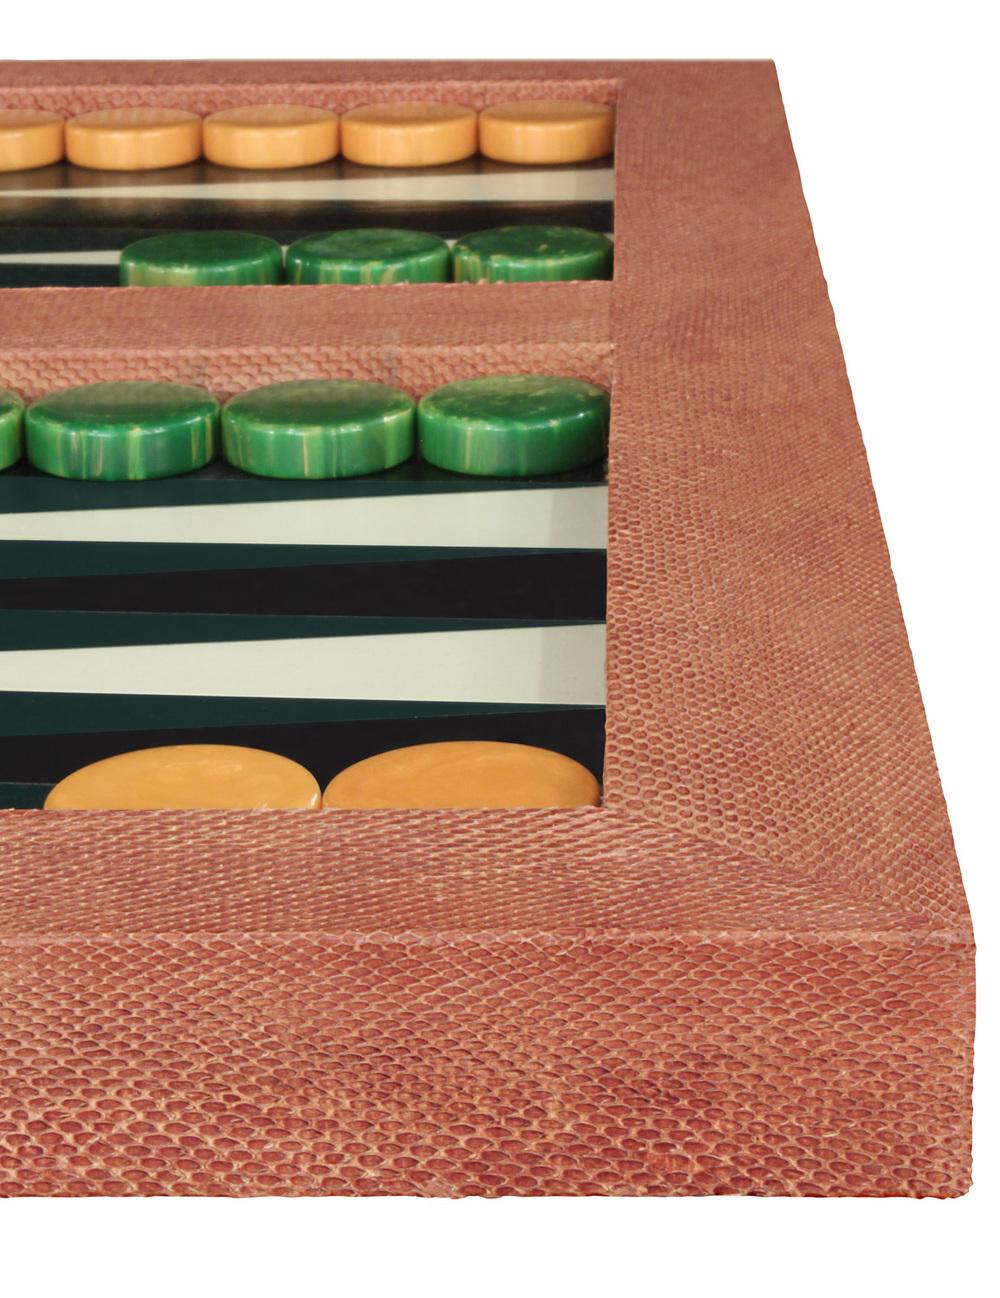 Springer 55 backgammon board gametable47 detail3 hires.jpg